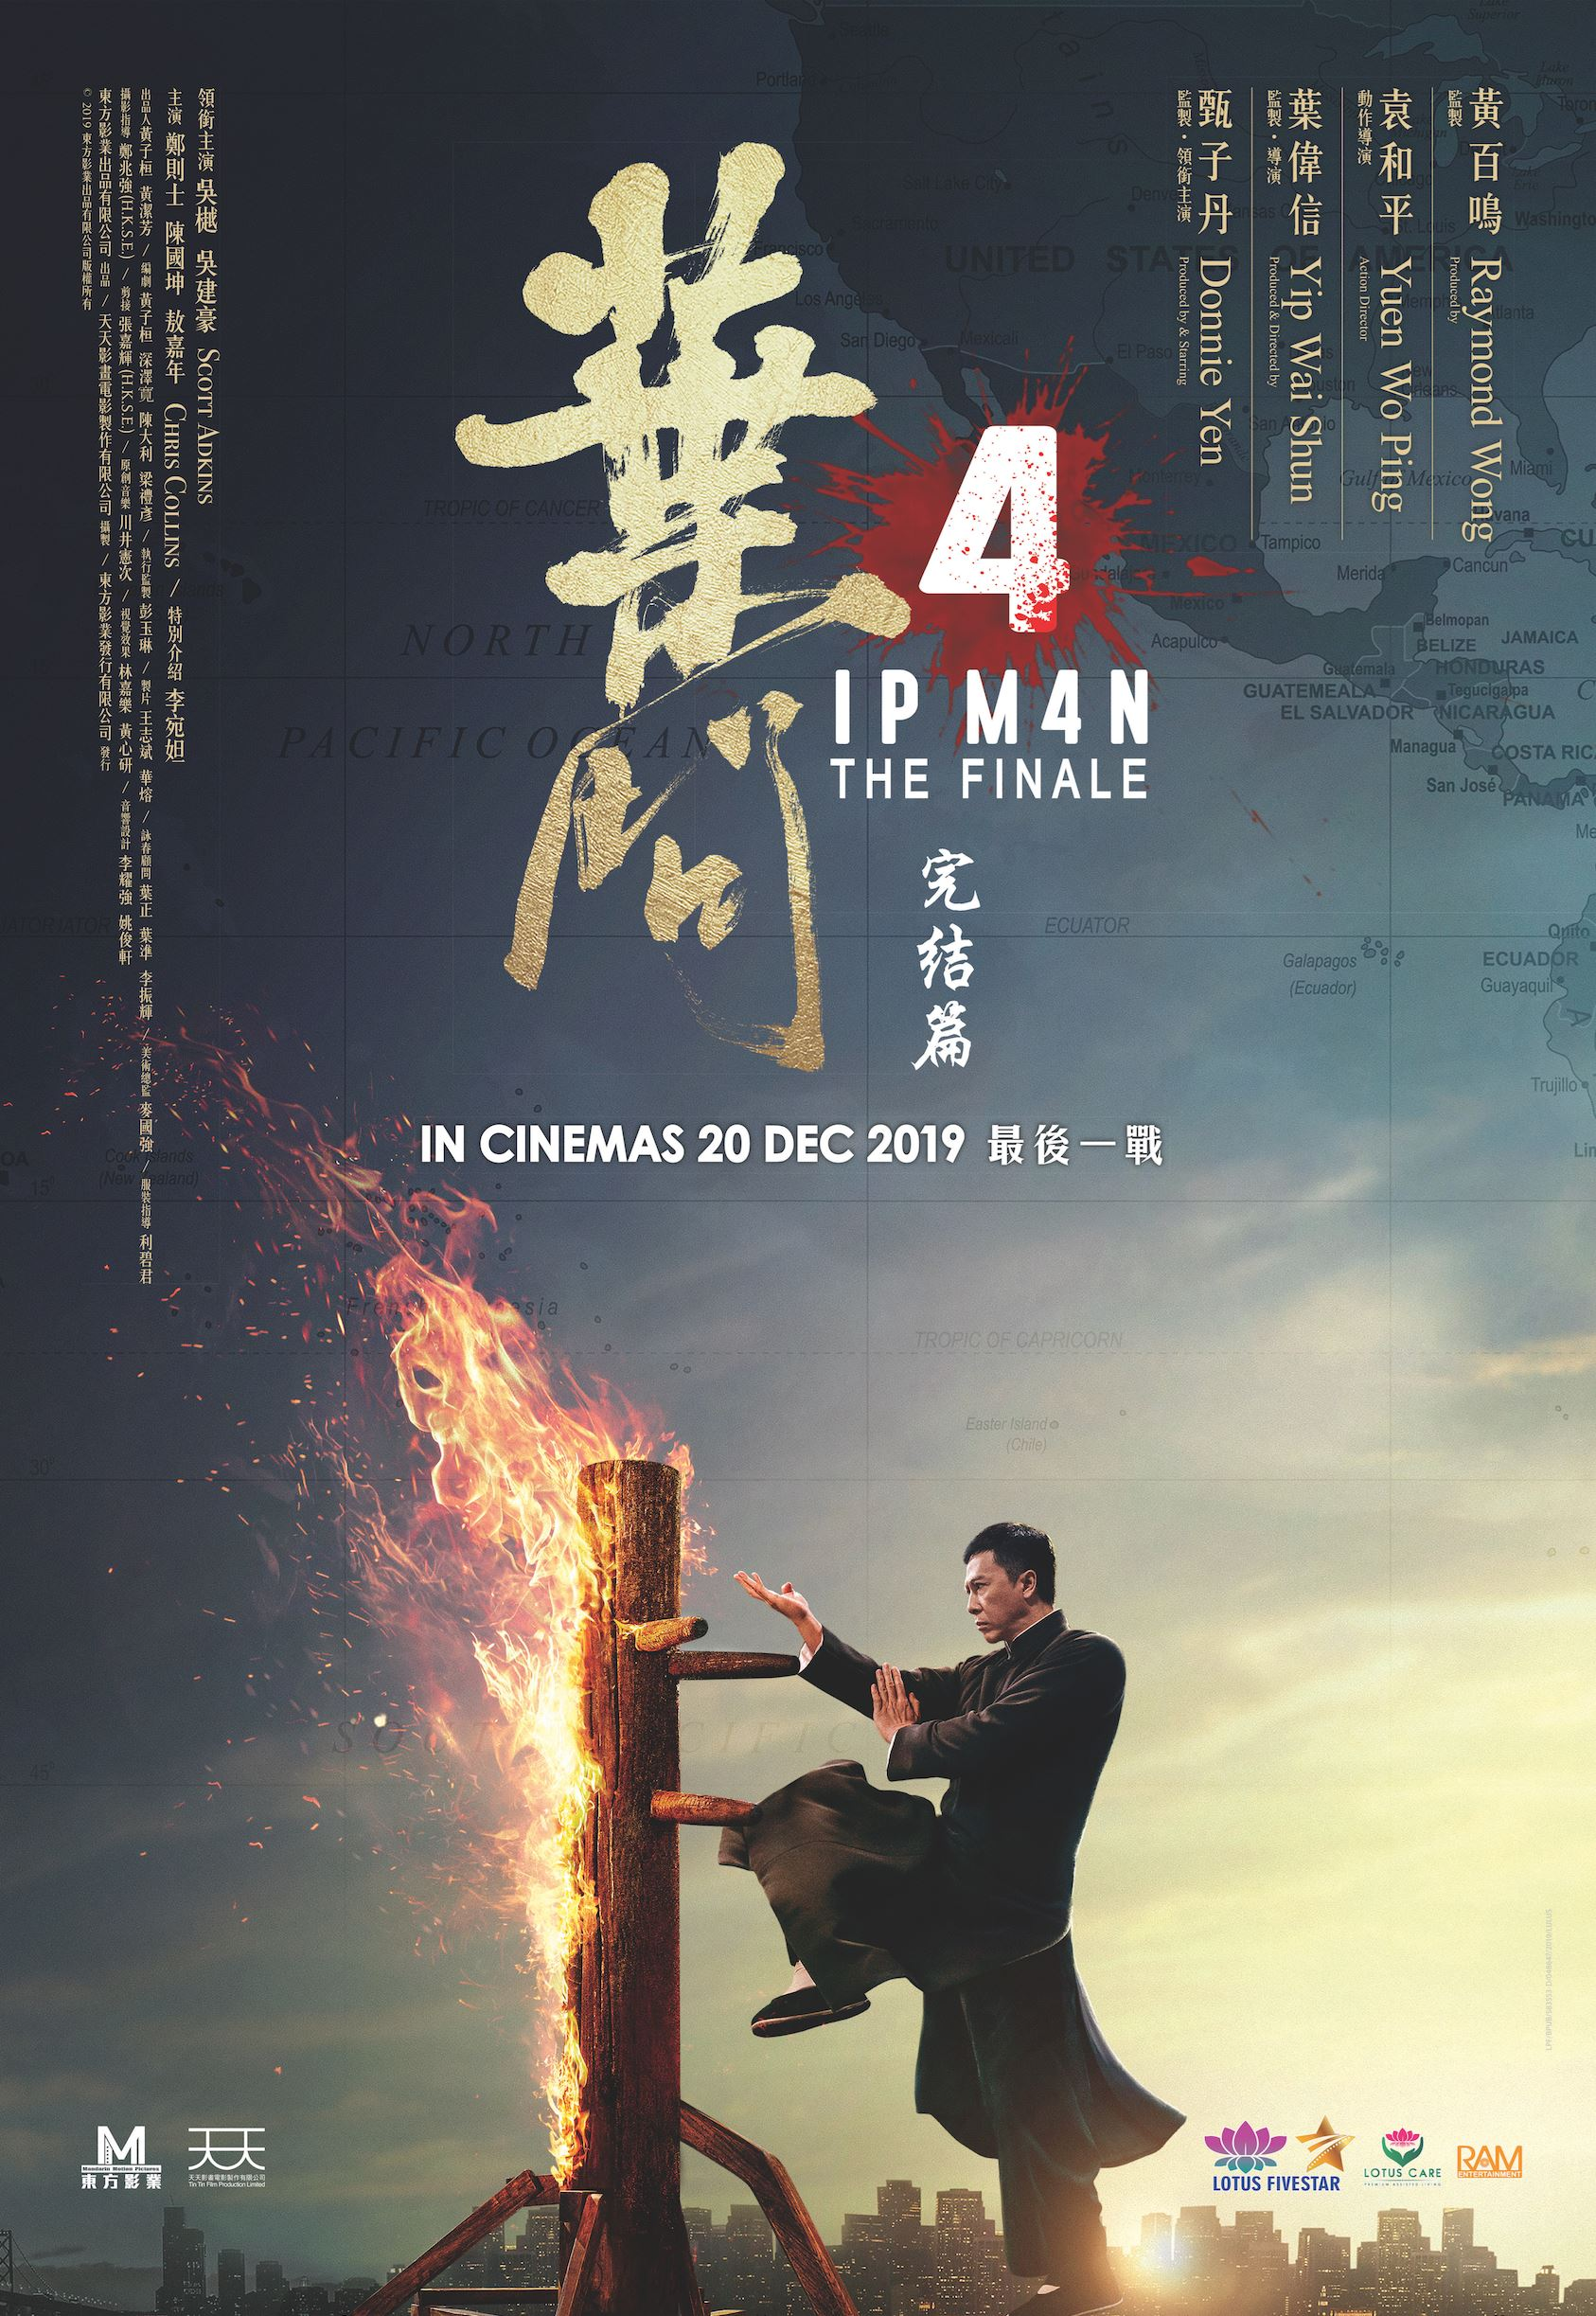 pawagam sinar: ip man 4- the finale